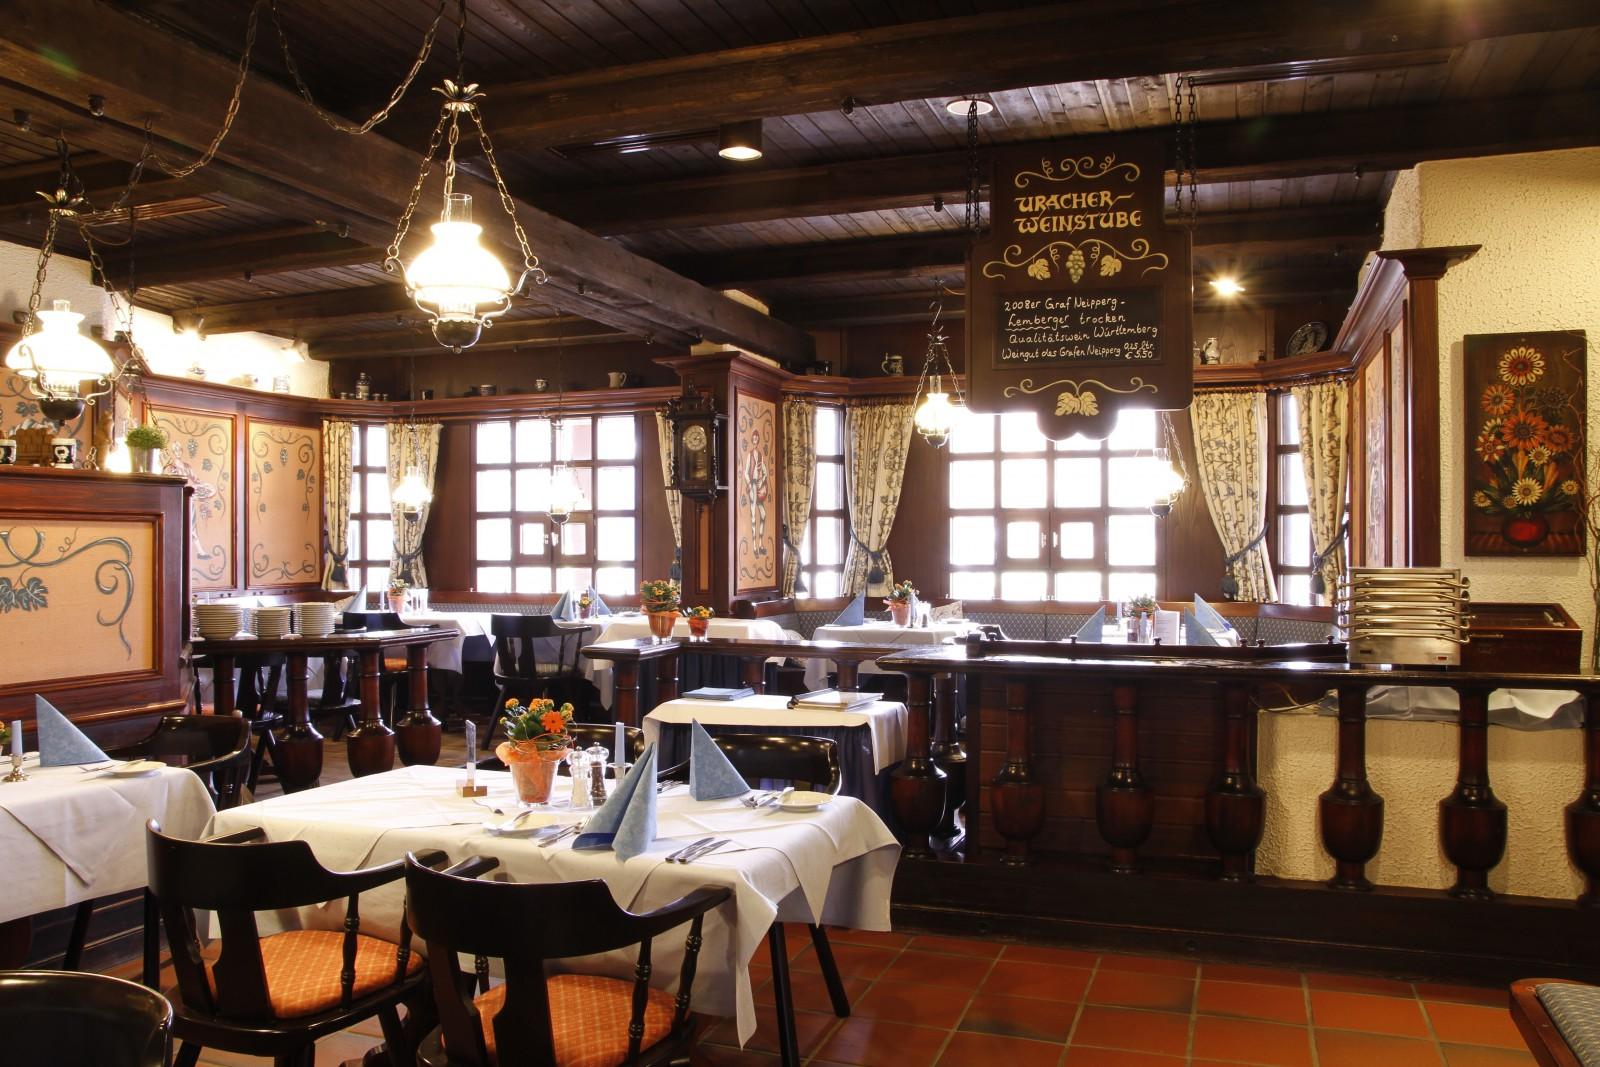 Restaurant Biospharenhotel Graf Eberhard In Bad Urach